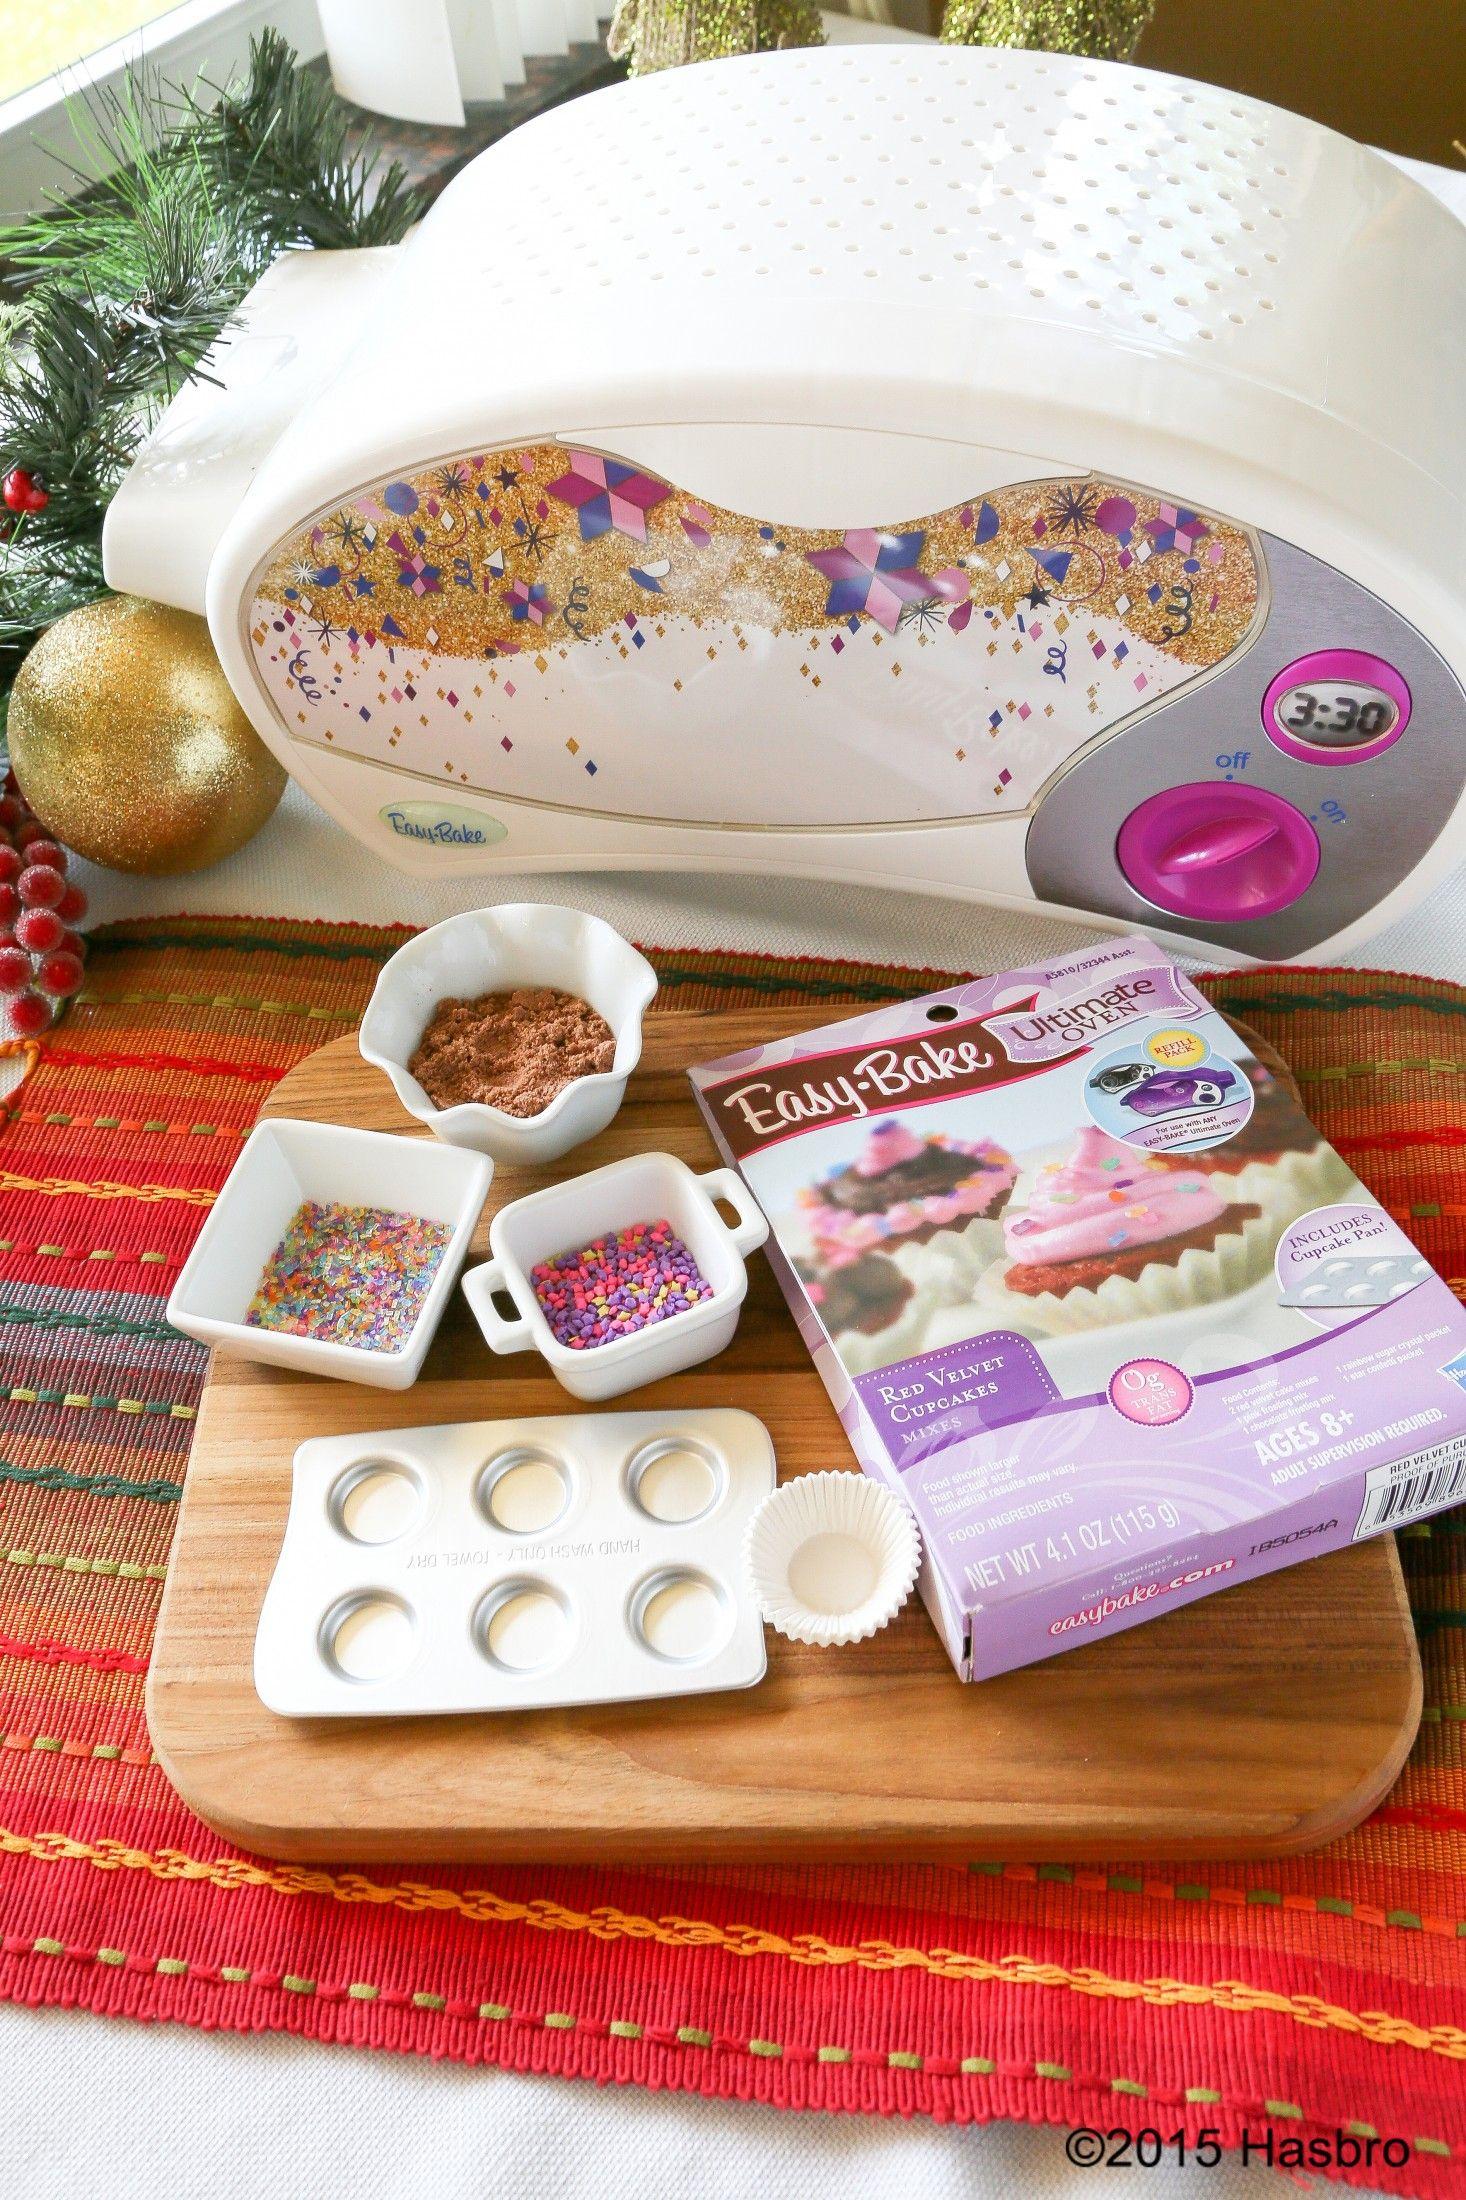 Easy-Bake Ultimate Oven Baking Star Edition